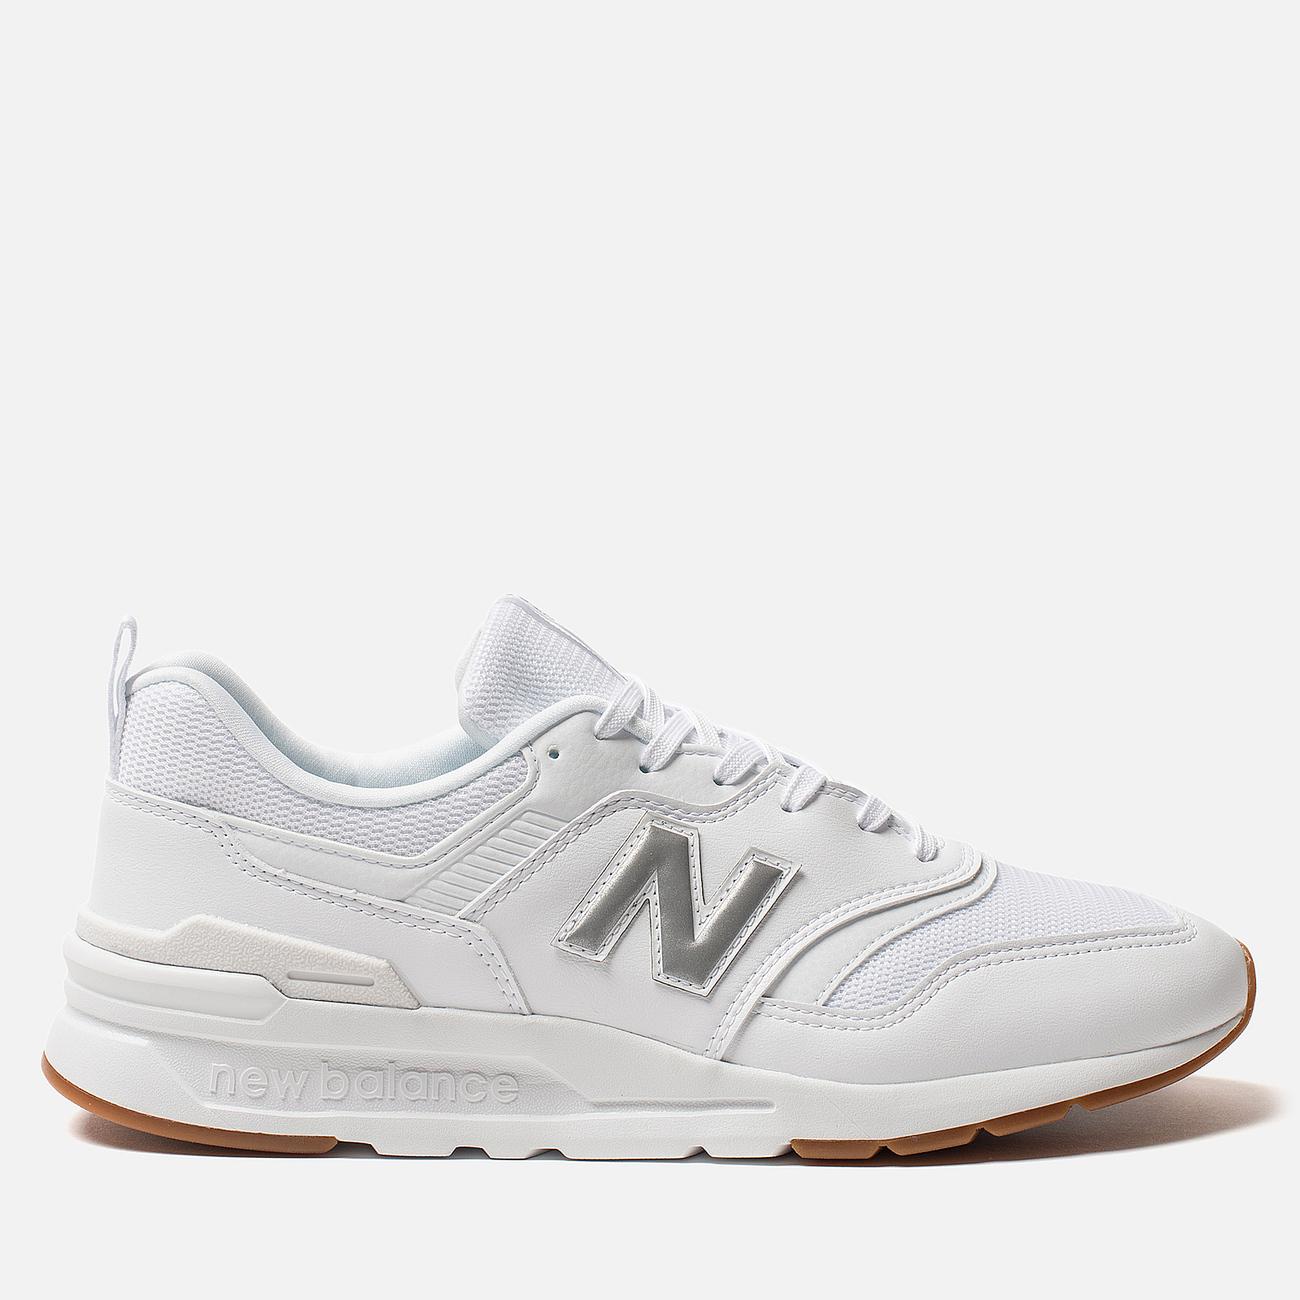 Мужские кроссовки New Balance CM997HCN White